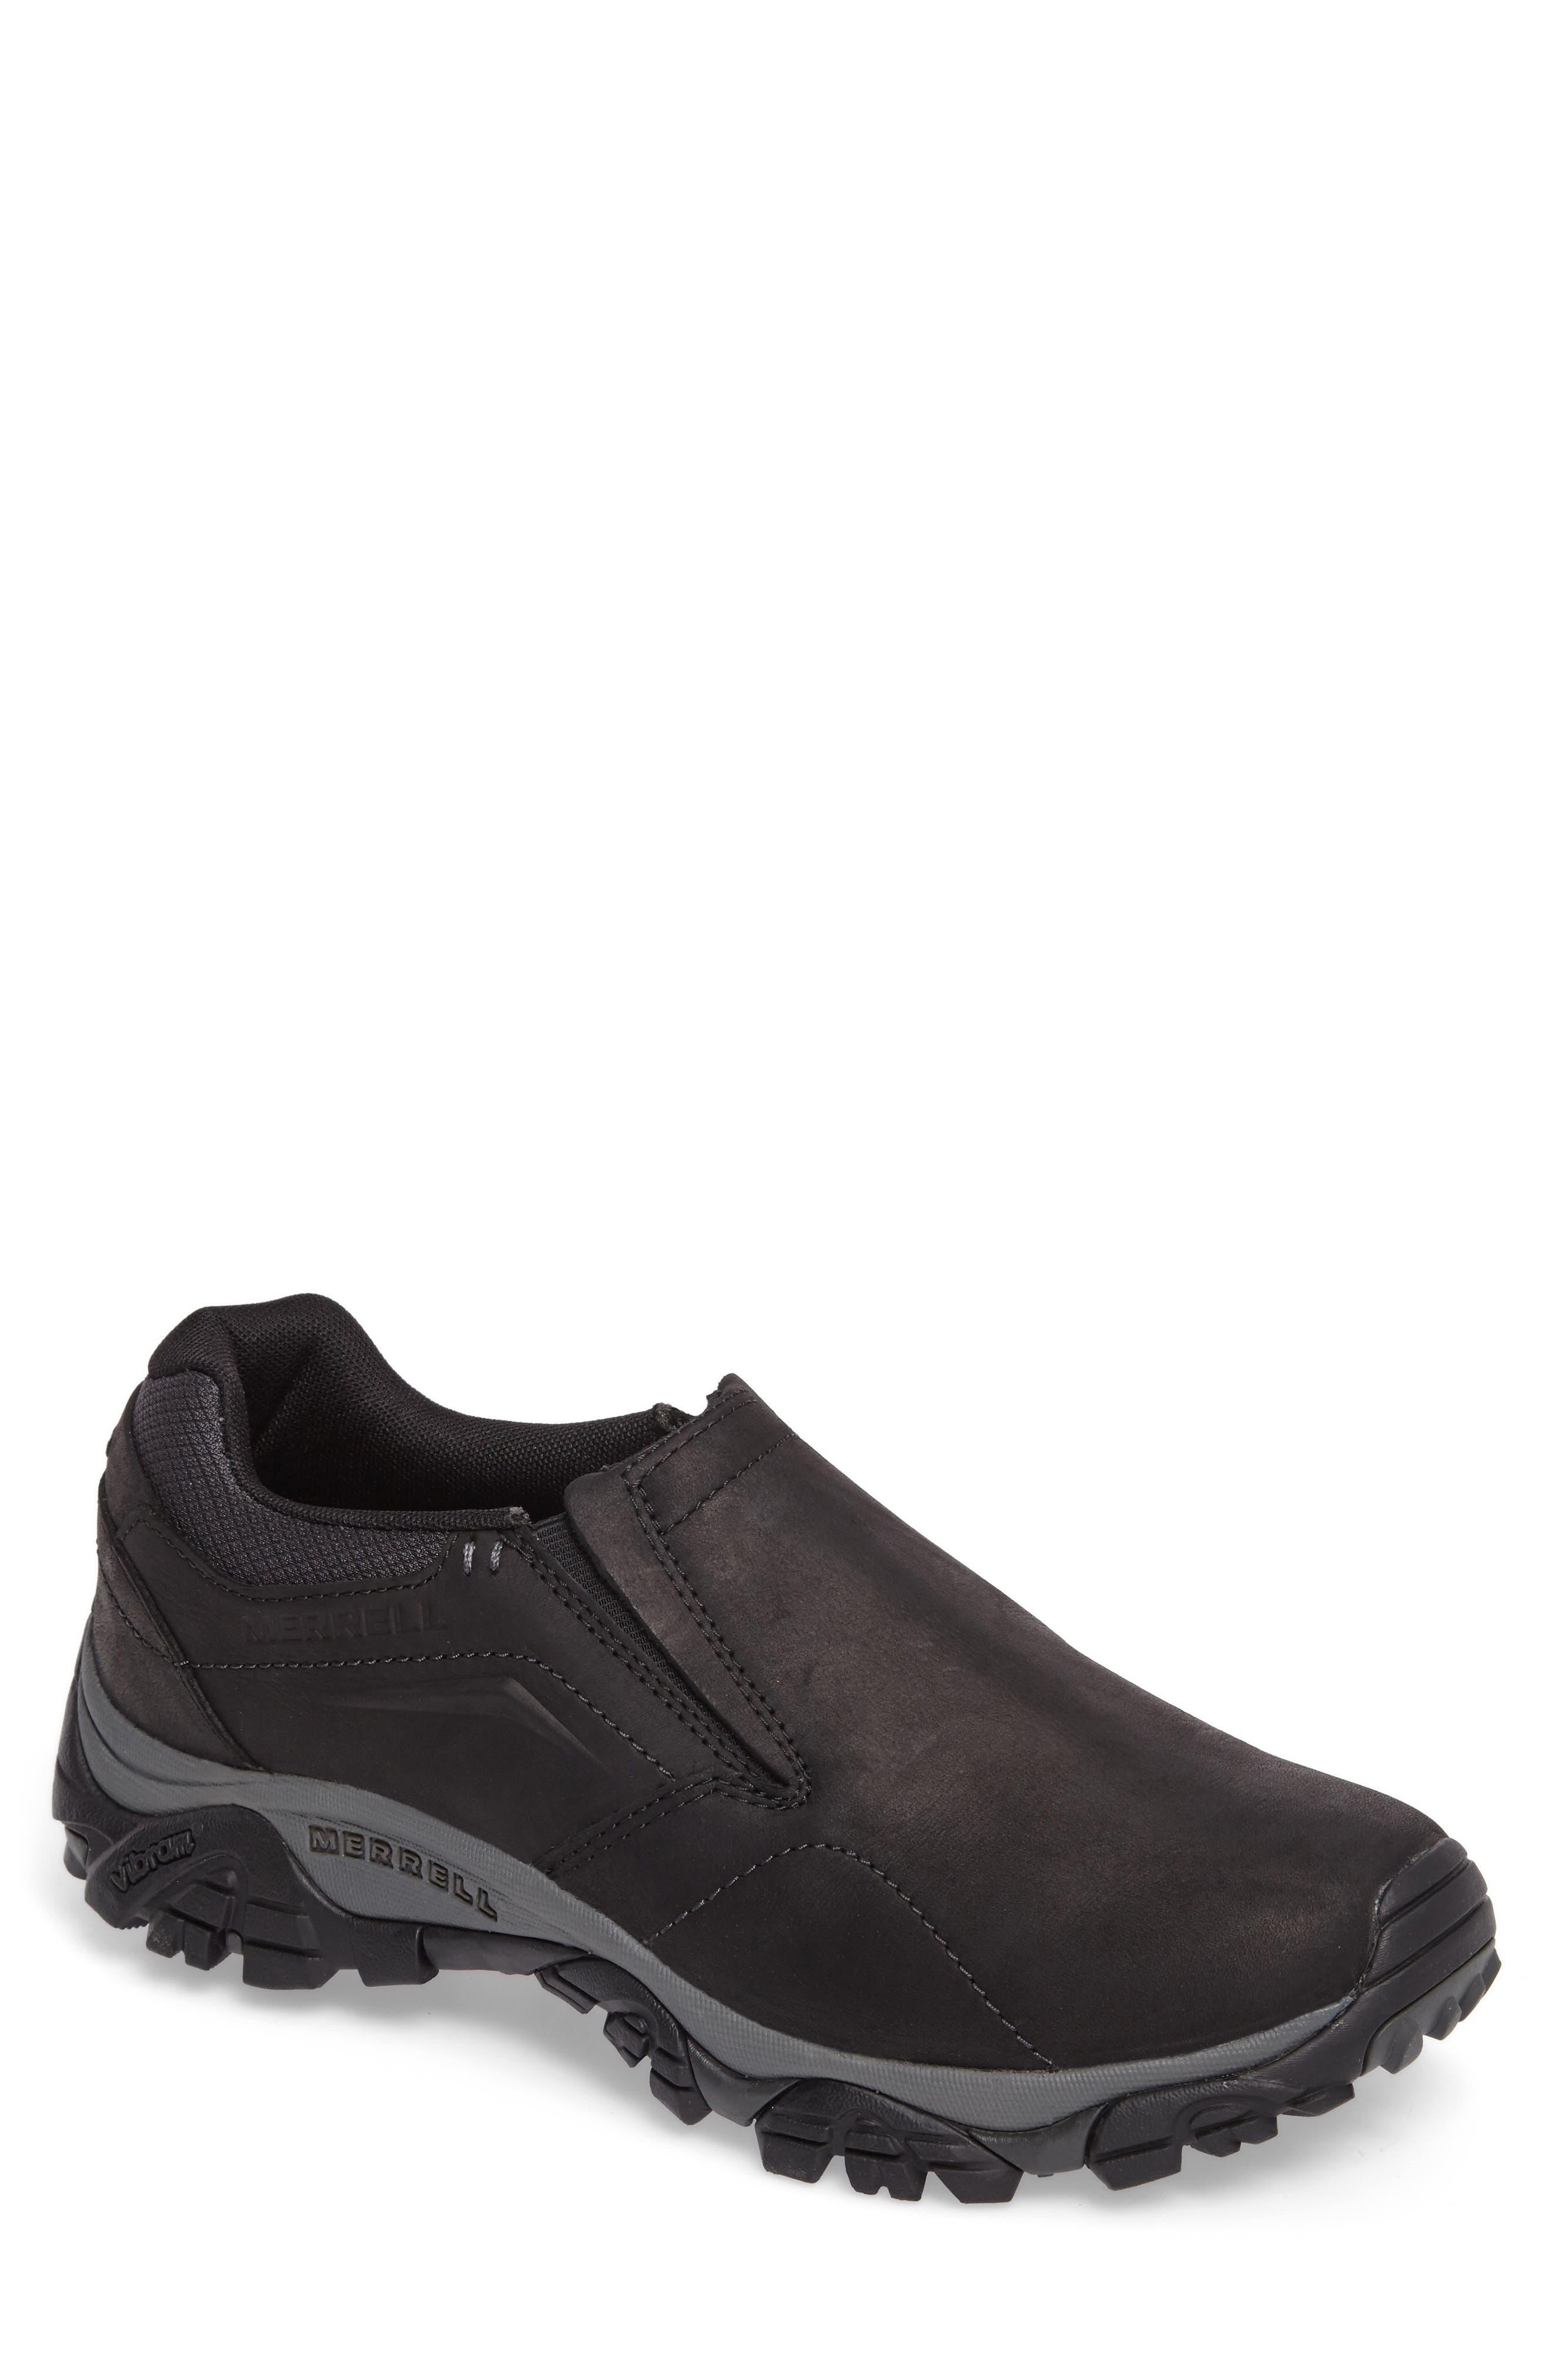 Moab Adventure Hiking Shoe,                         Main,                         color, BLACK NUBUCK LEATHER